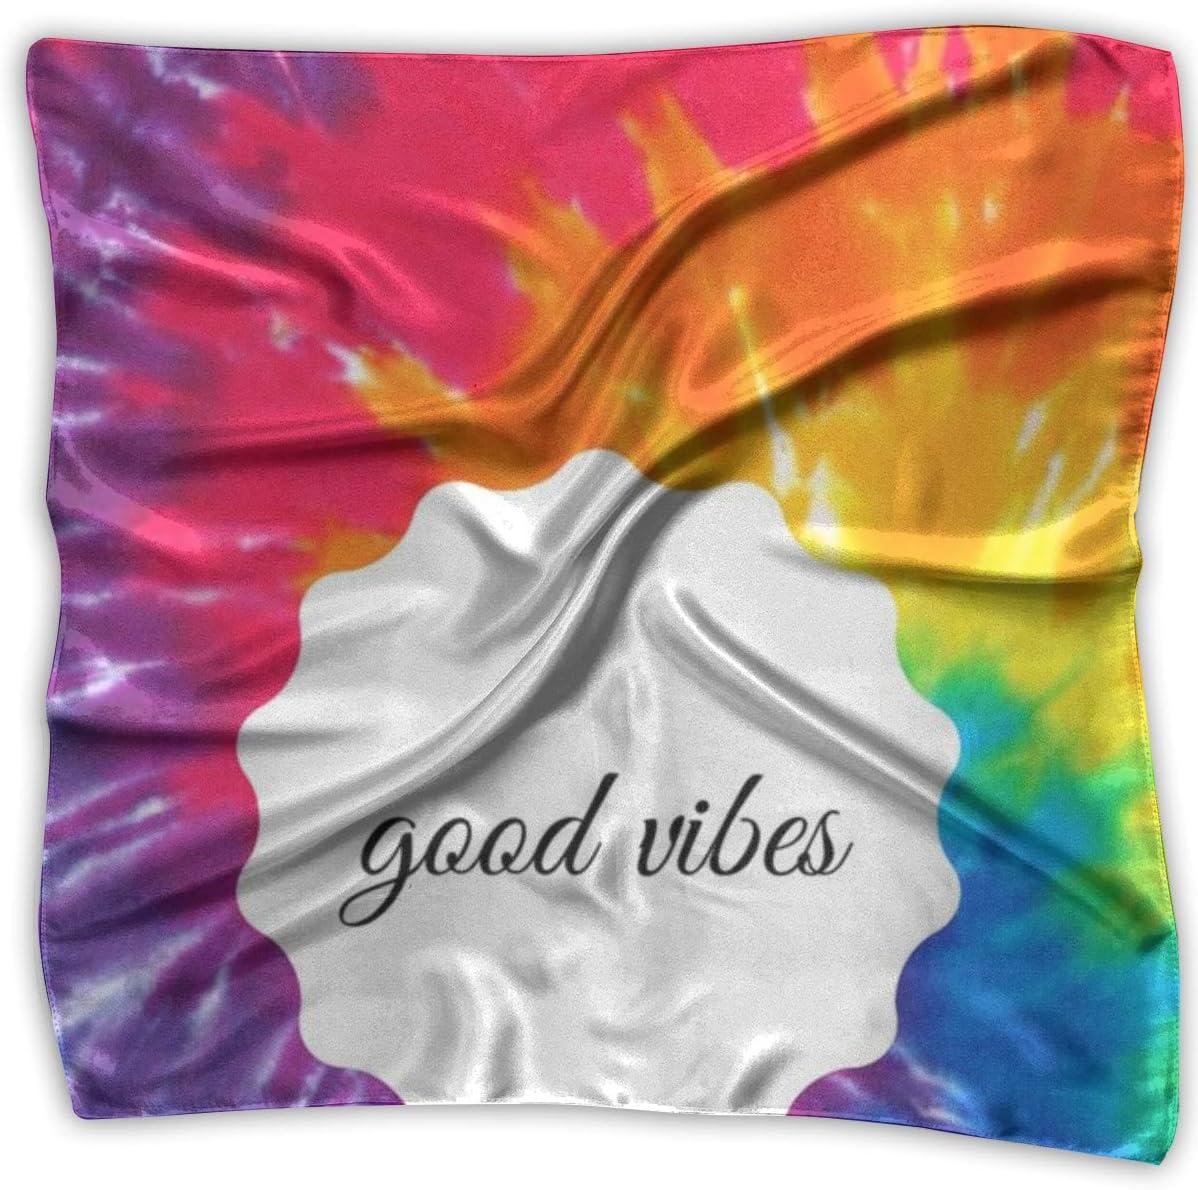 YANGZXC Multi-Color Tie Dye Good Vibes Handkerchief Polyester Pocket Square Mulipurpose Silk Bandanas Delicate Printing